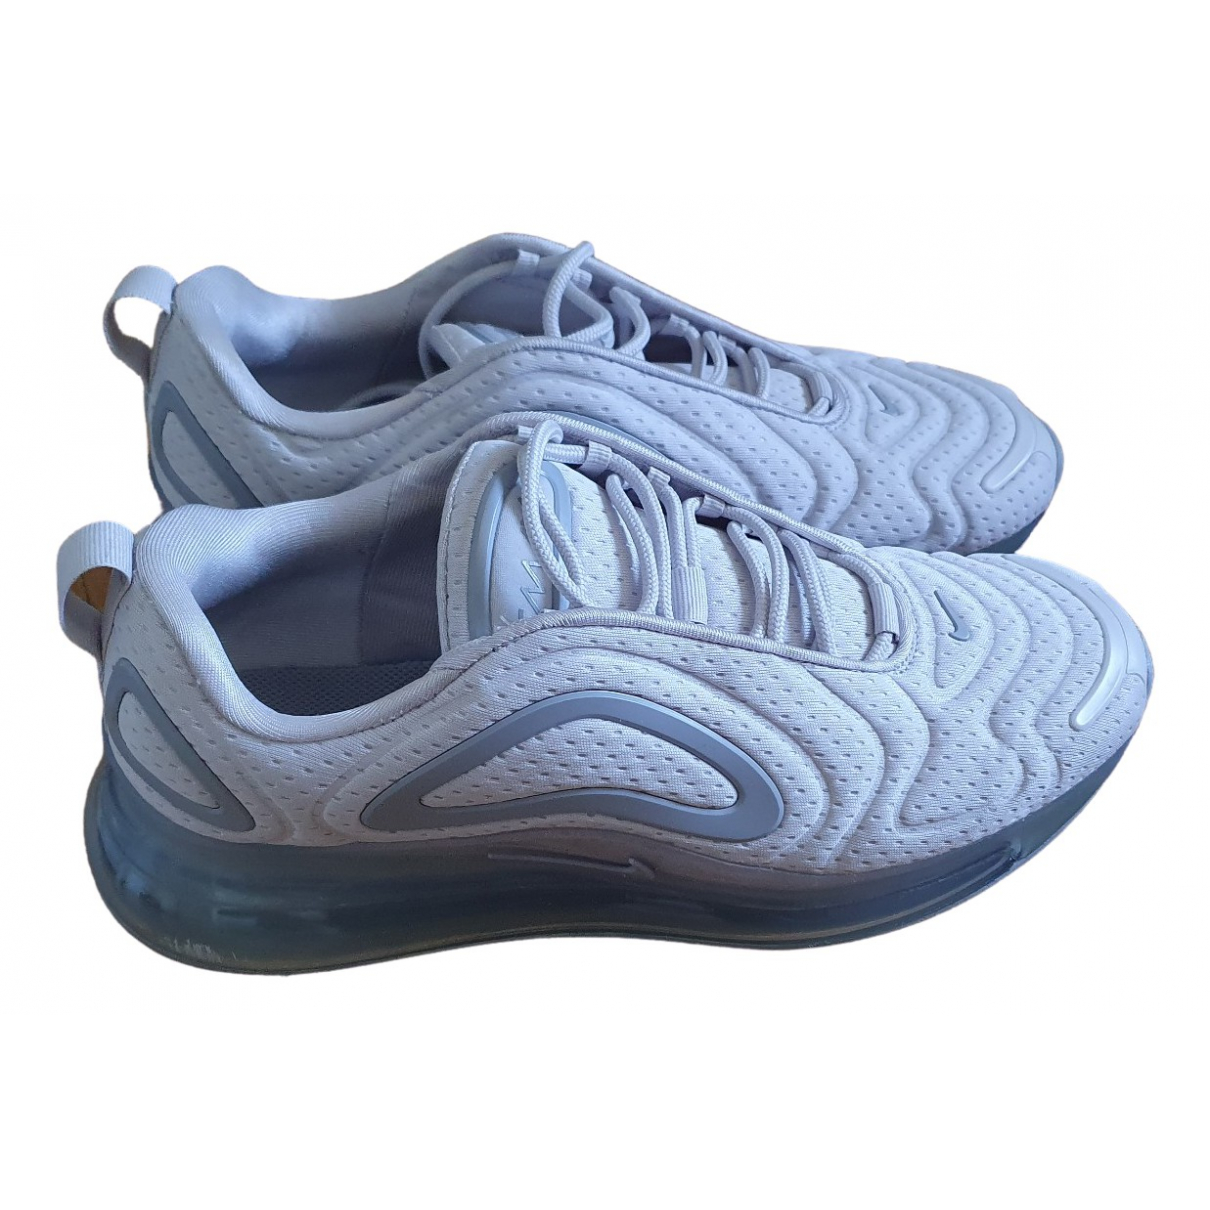 Nike Air Max 720 Grey Cloth Trainers for Men 43 EU